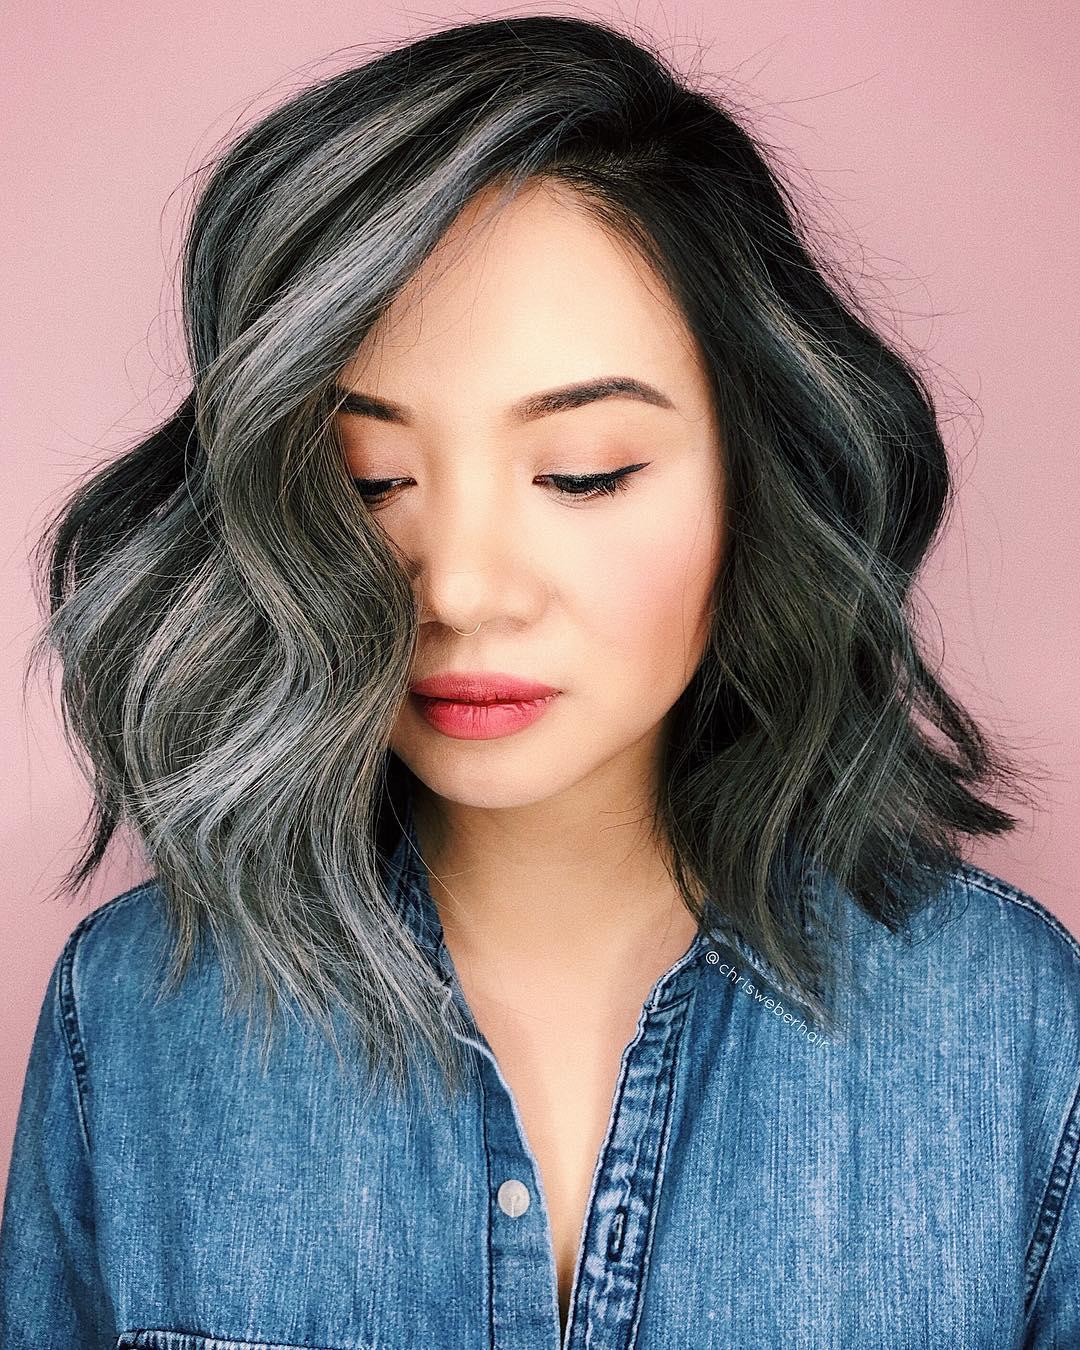 Black Layered Lob with Big Soft Waves and Smoky Grey Balayage Highlights Medium Length Hairstyle